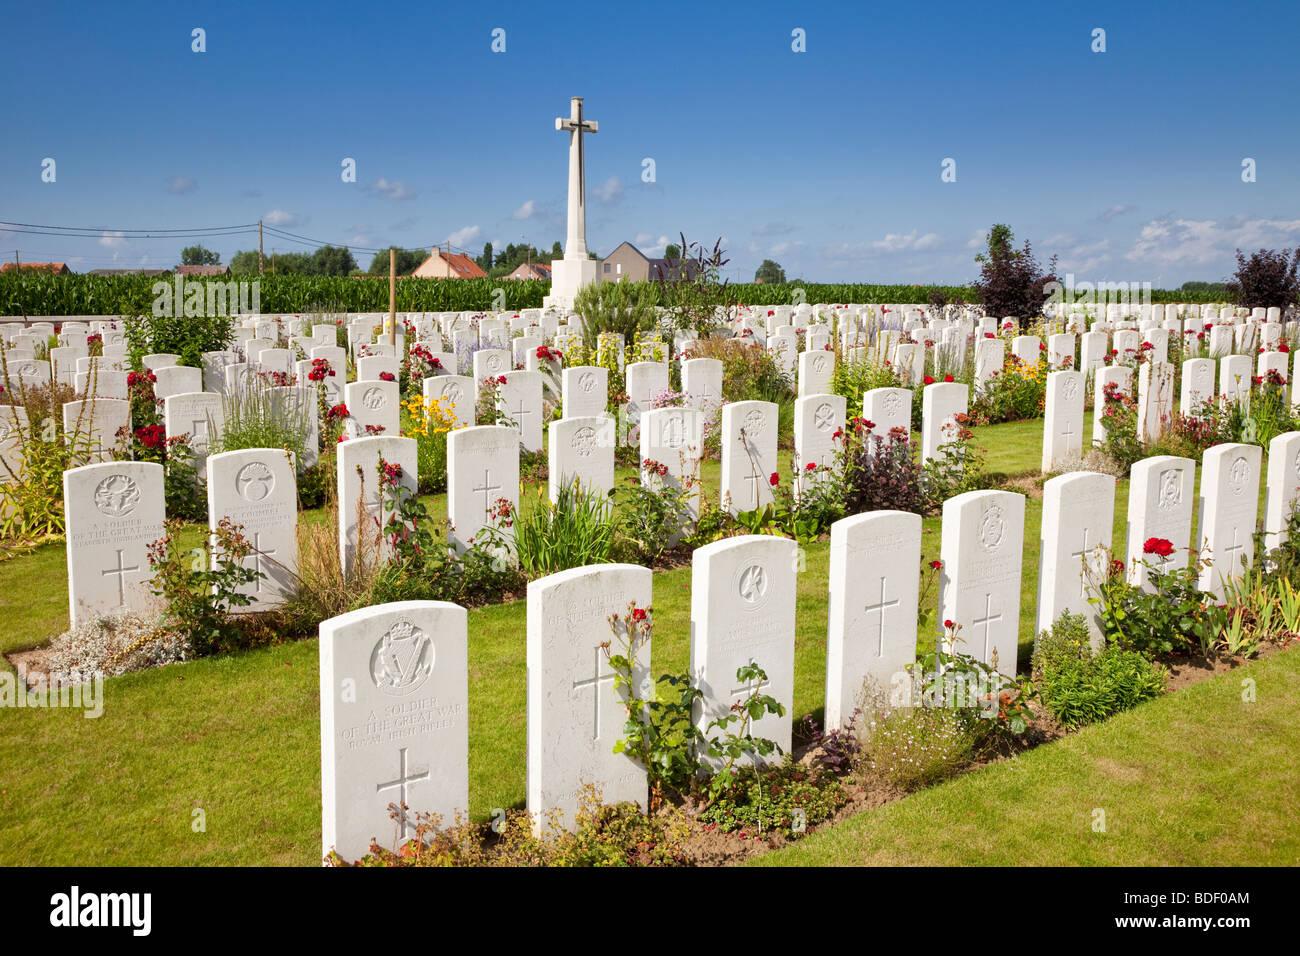 Belgium, Flanders - Dochy Farm World War 1 war graves in the British military cemetery, Ypres, Flanders, Belgium, - Stock Image